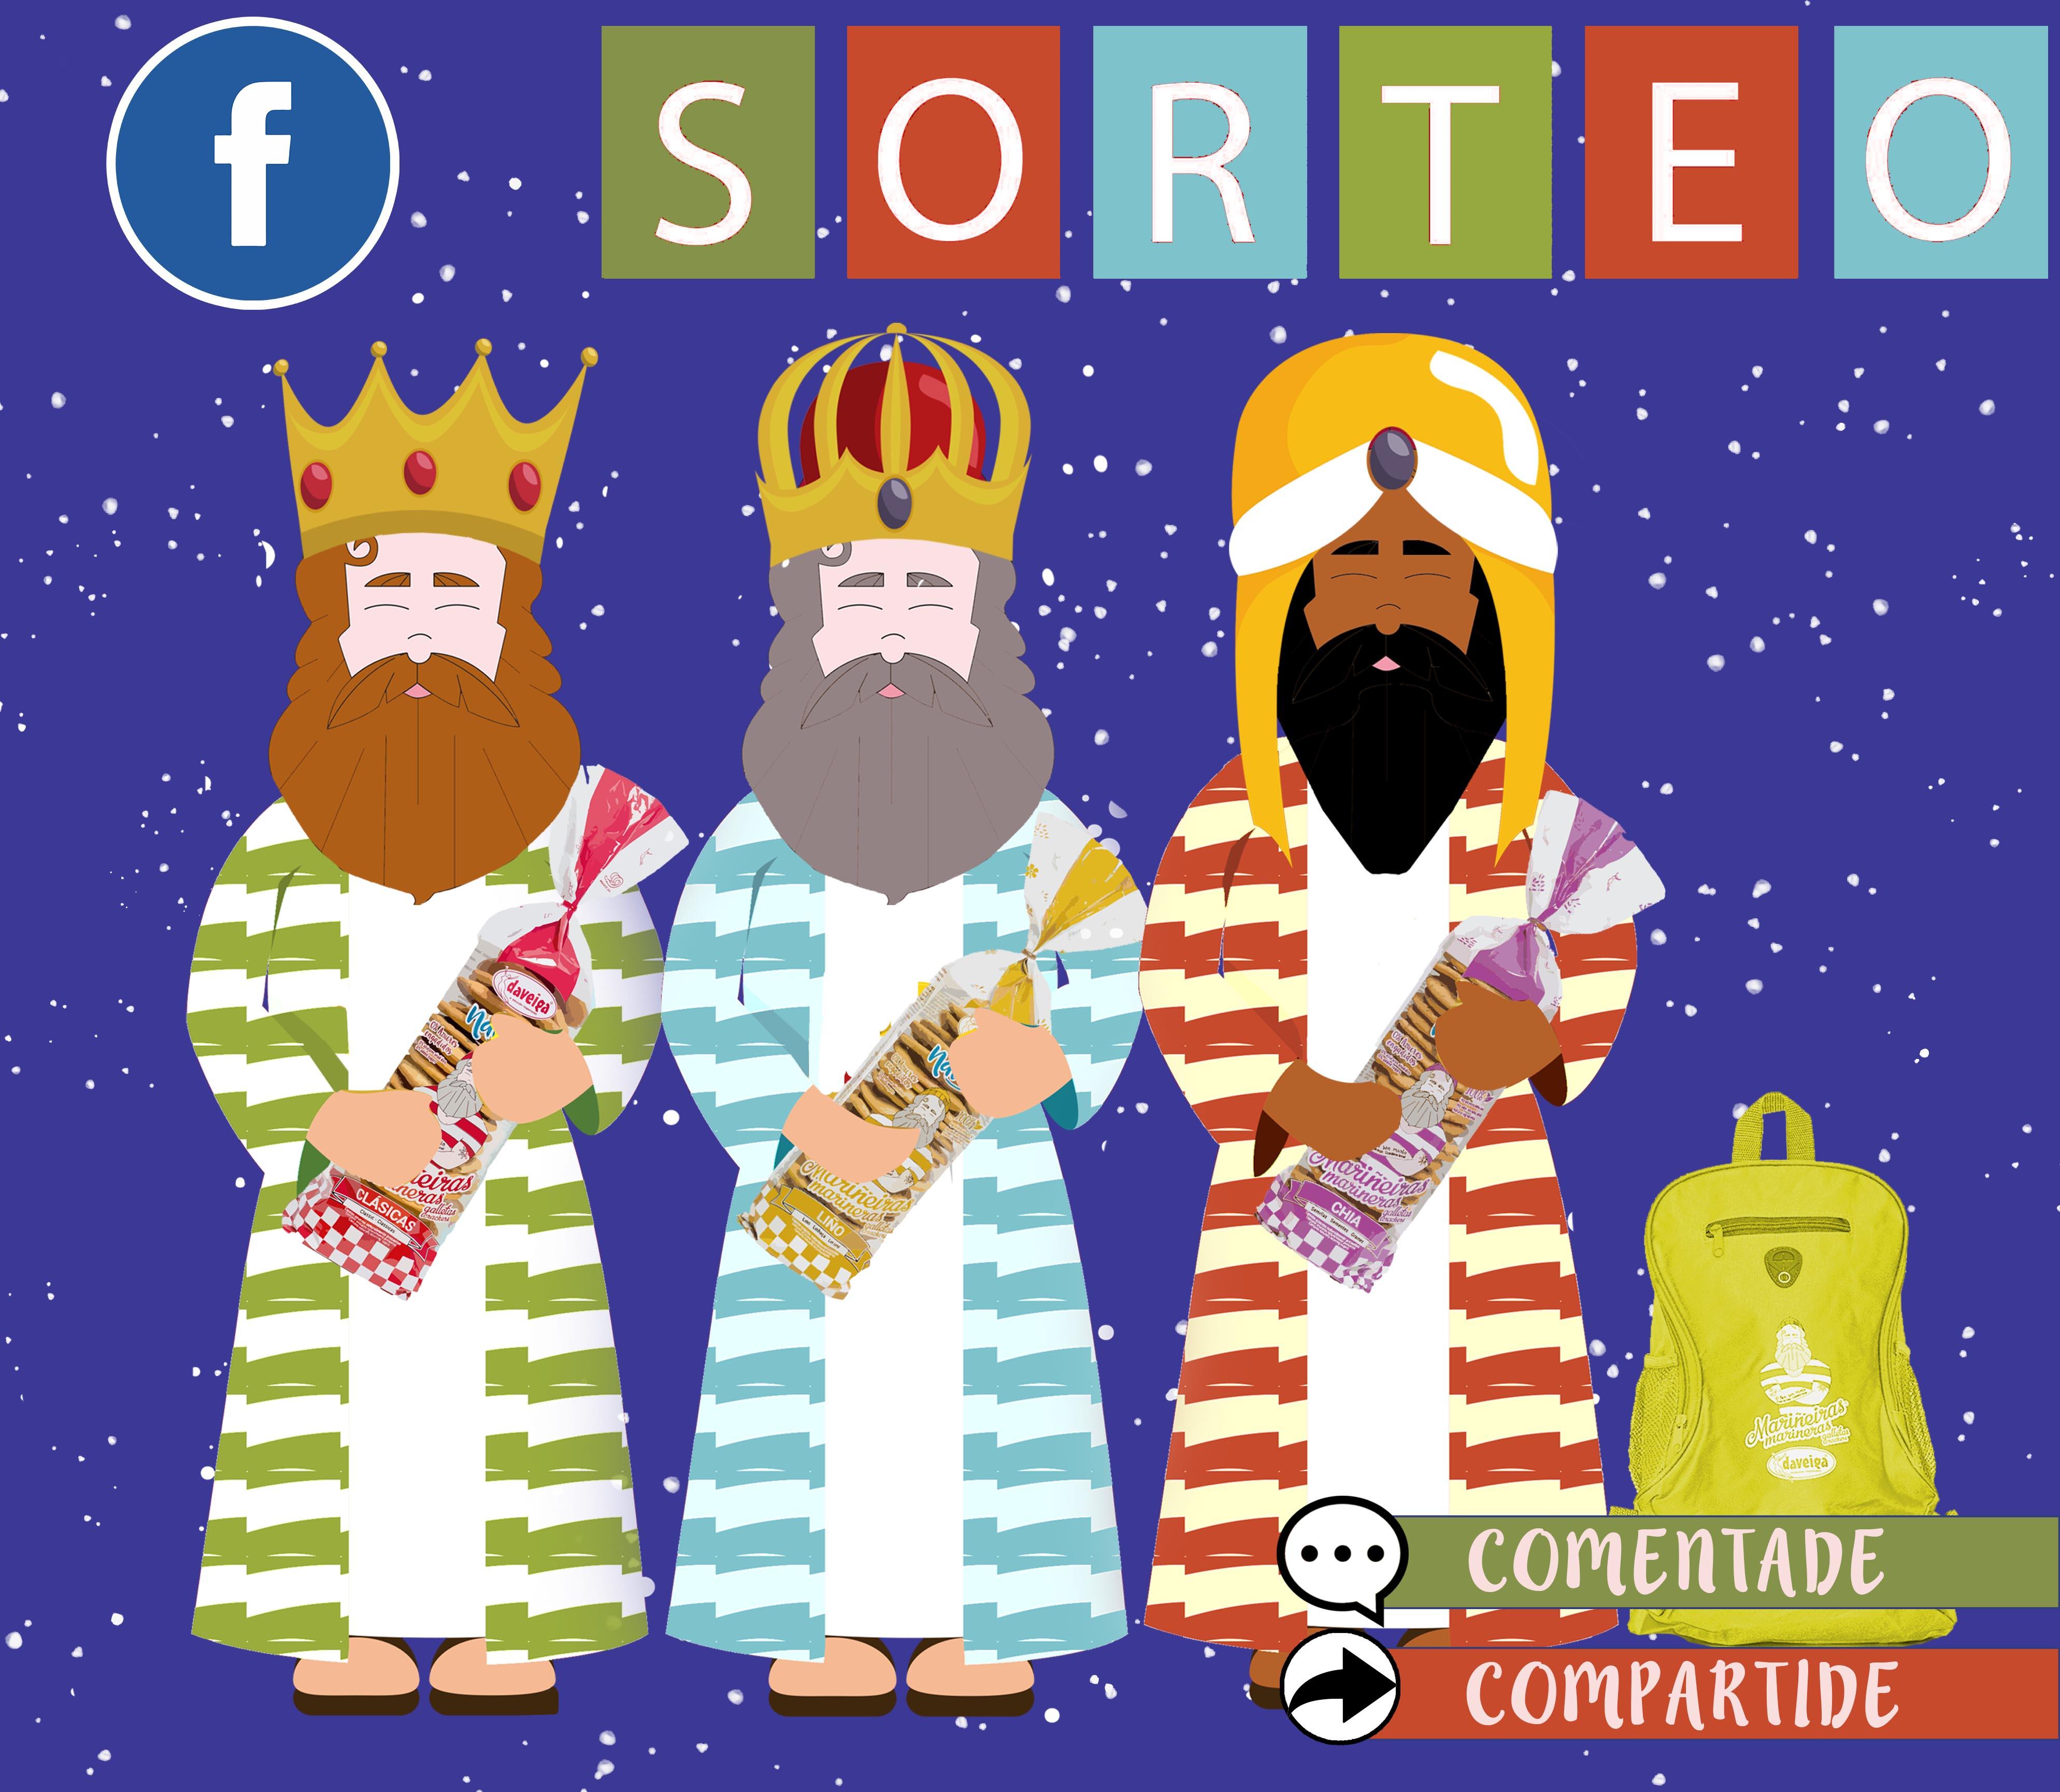 SORTEO_REIS